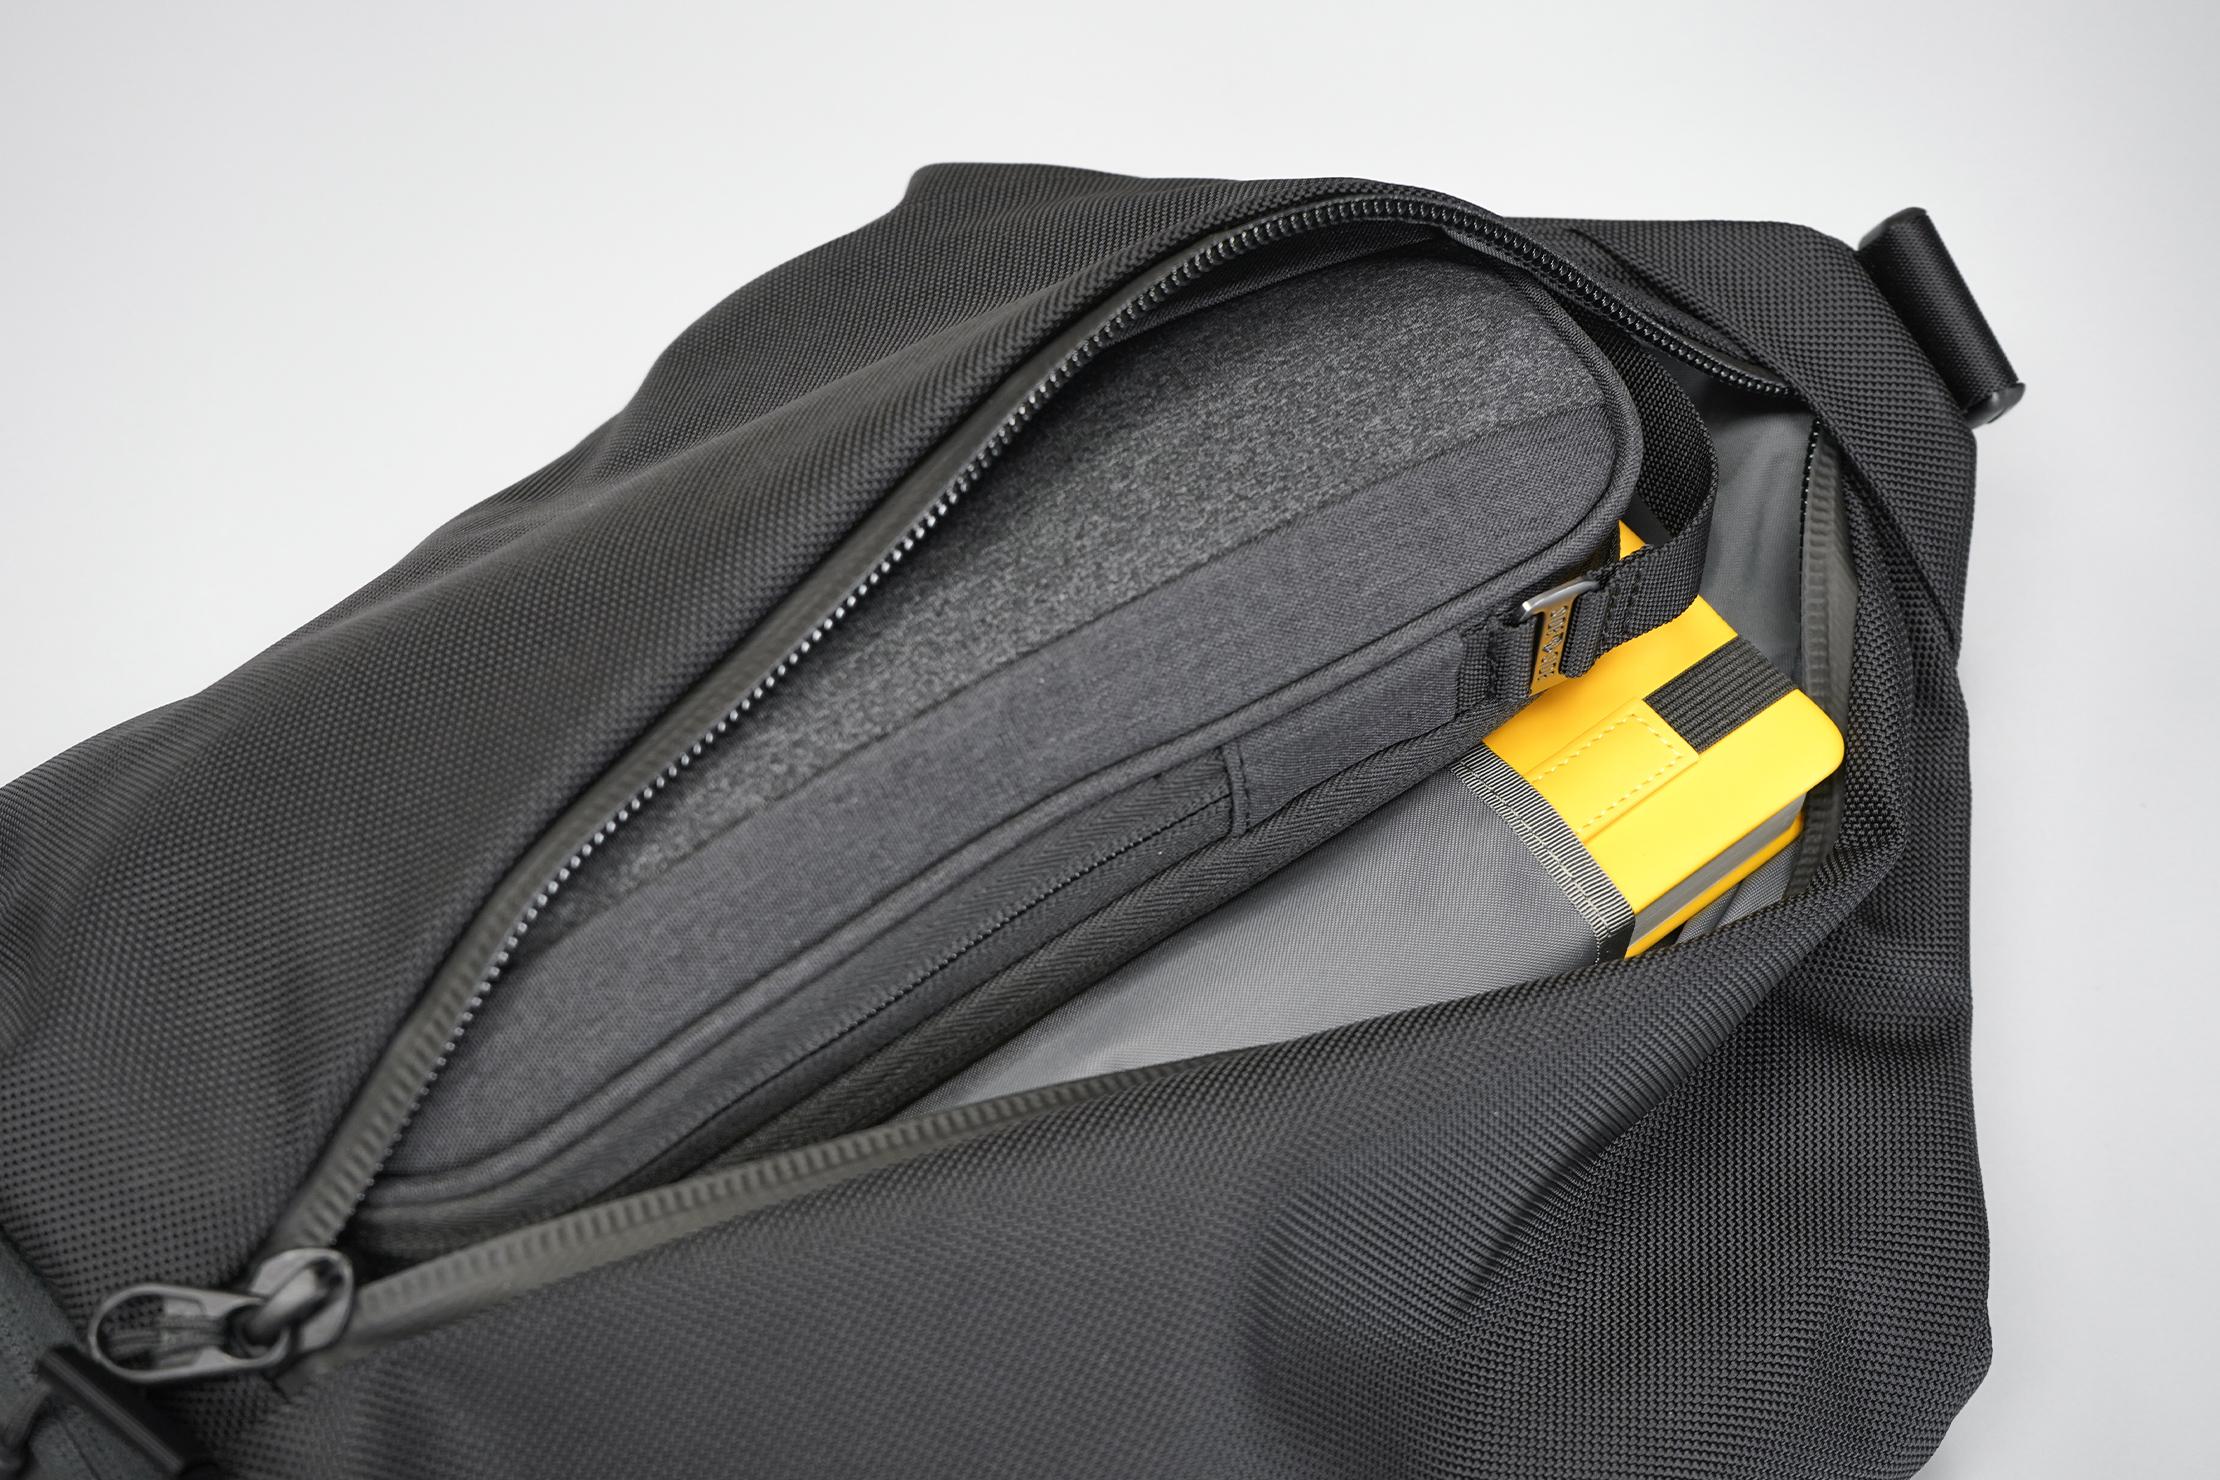 Aer Sling Bag 3 front compartment